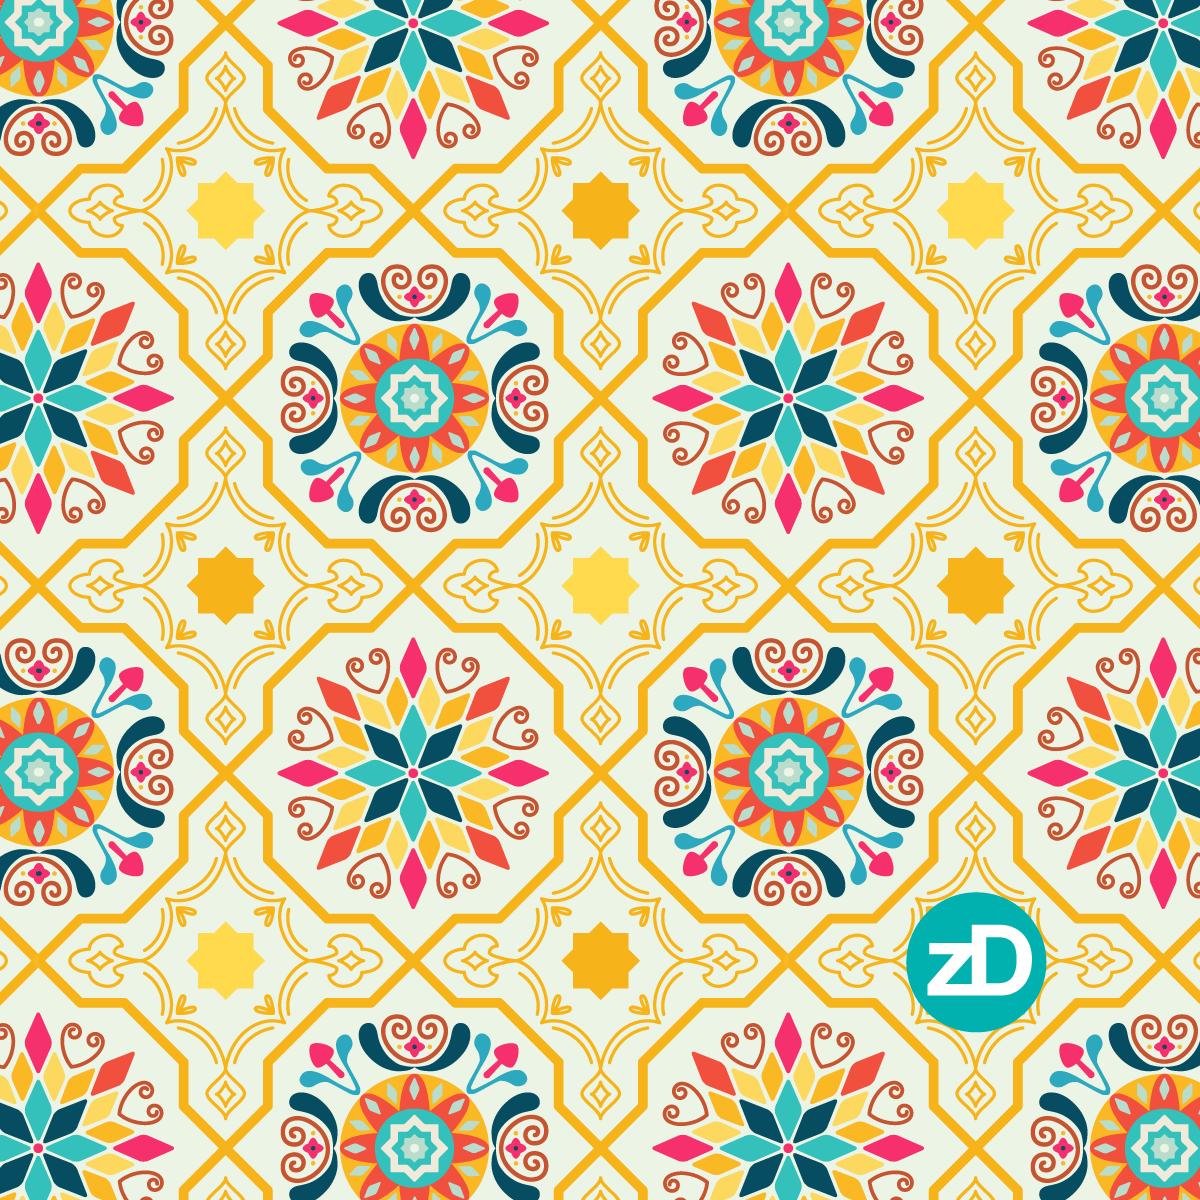 Zirkus Design | Cheery Modern Moorish Tiles Fabric Design - Intermediate Color Palette